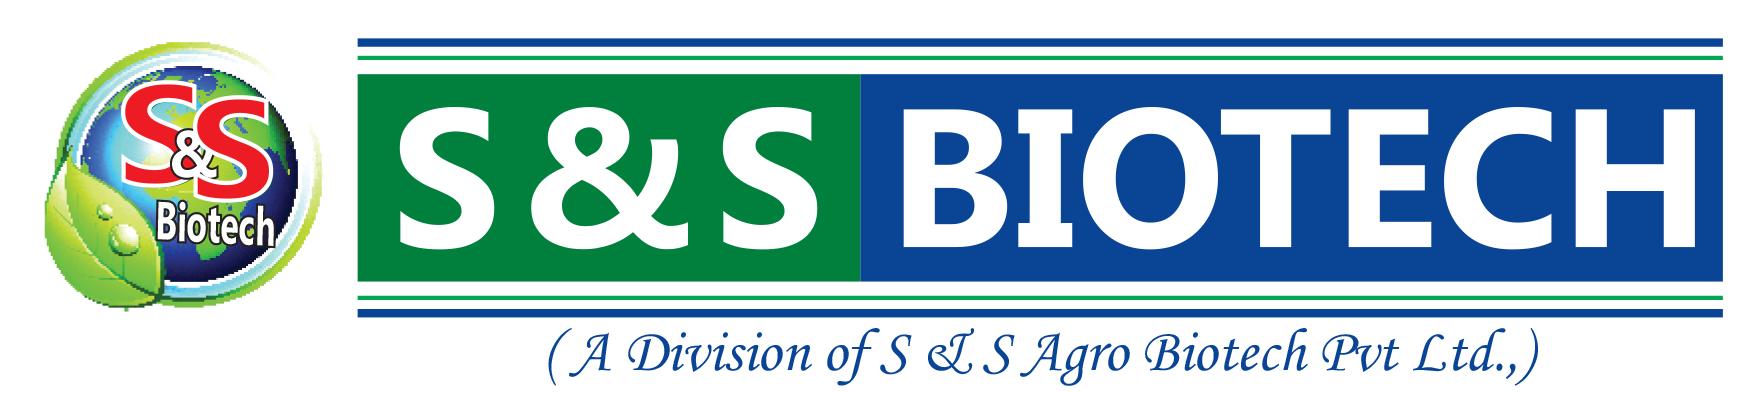 S&S Biotech